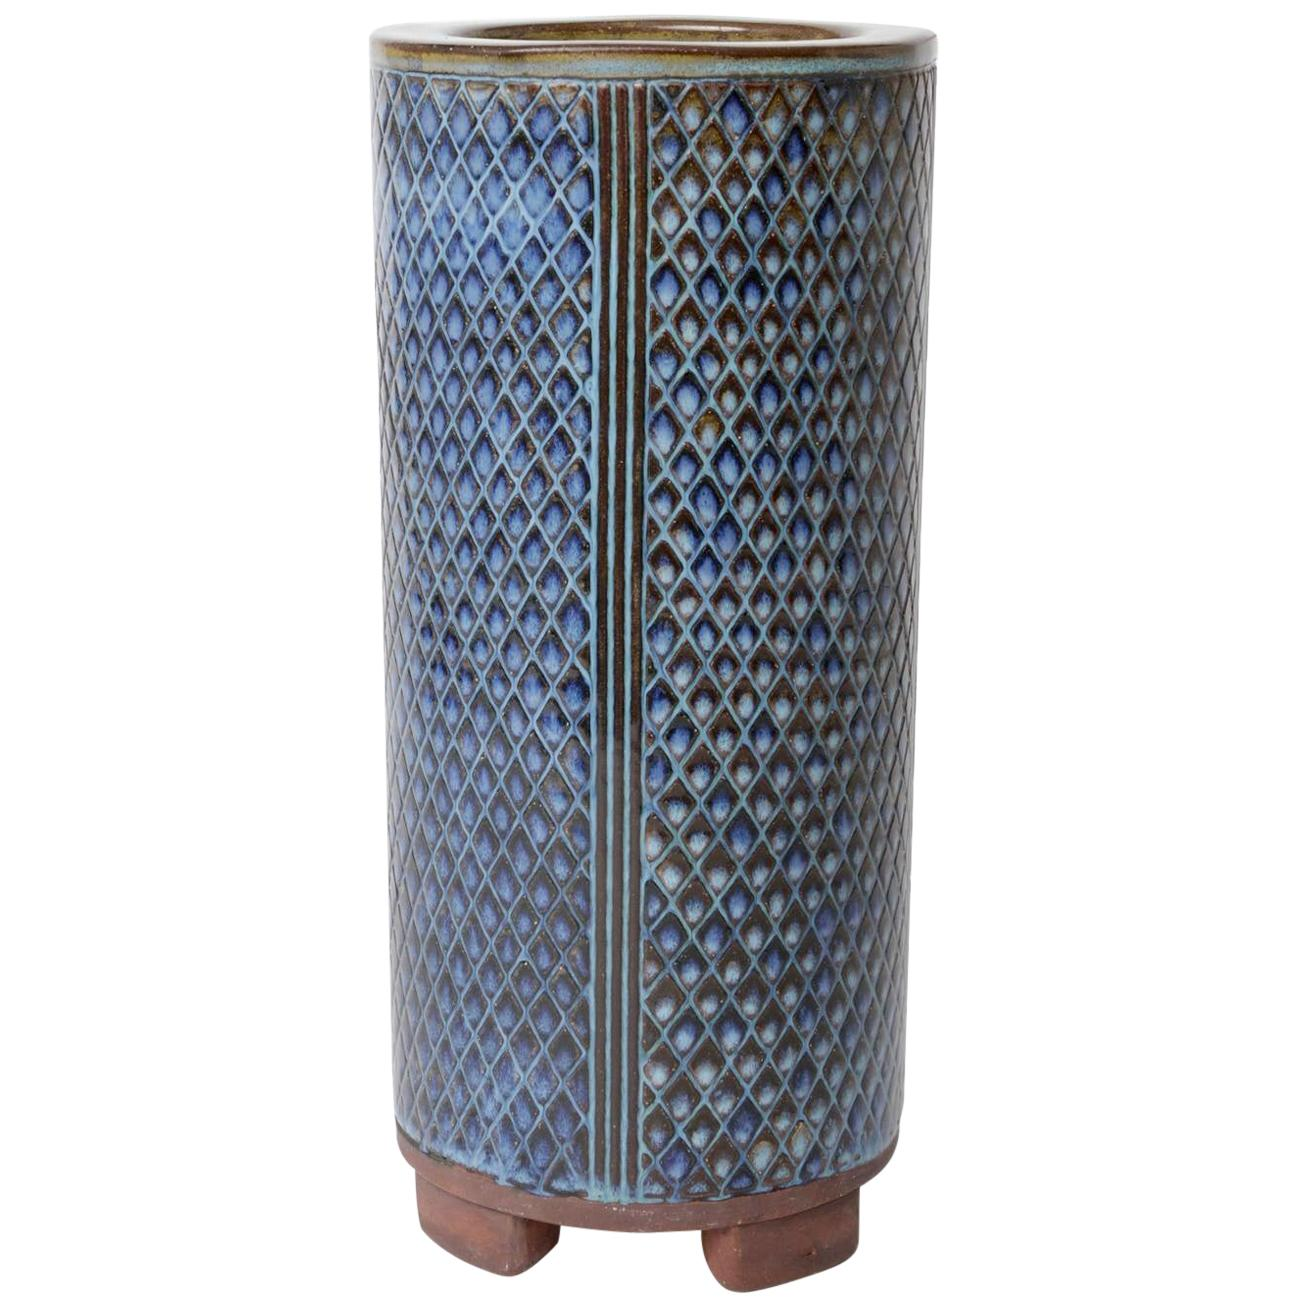 Wilhem Kage for Gustavsberg Large Swedish Farsta Stoneware Vase, 1950